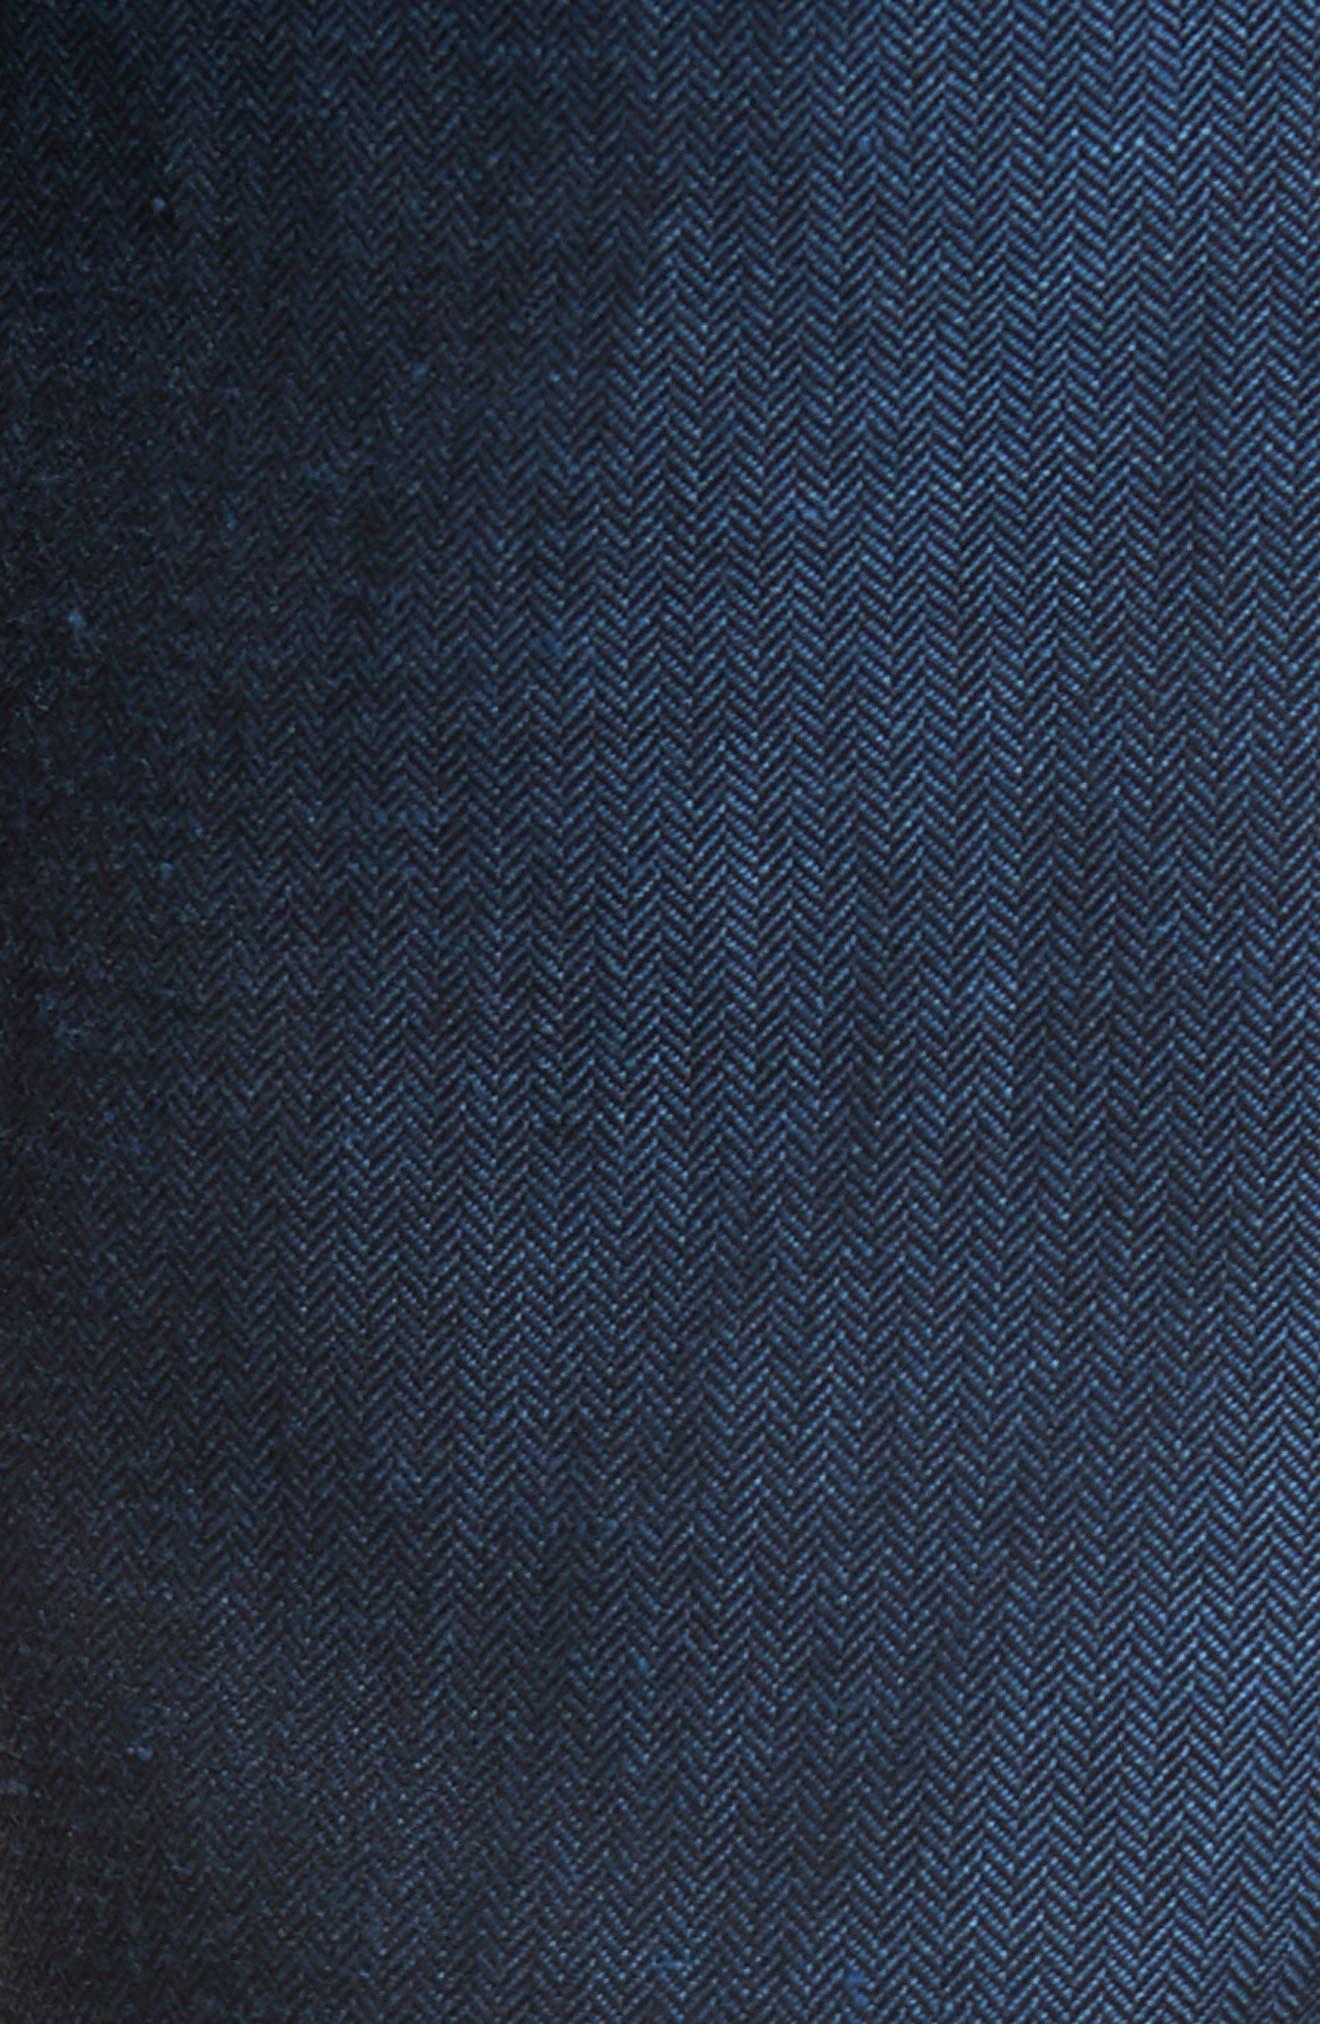 Cazzman Flat Front Stretch Pants,                             Alternate thumbnail 5, color,                             Navy